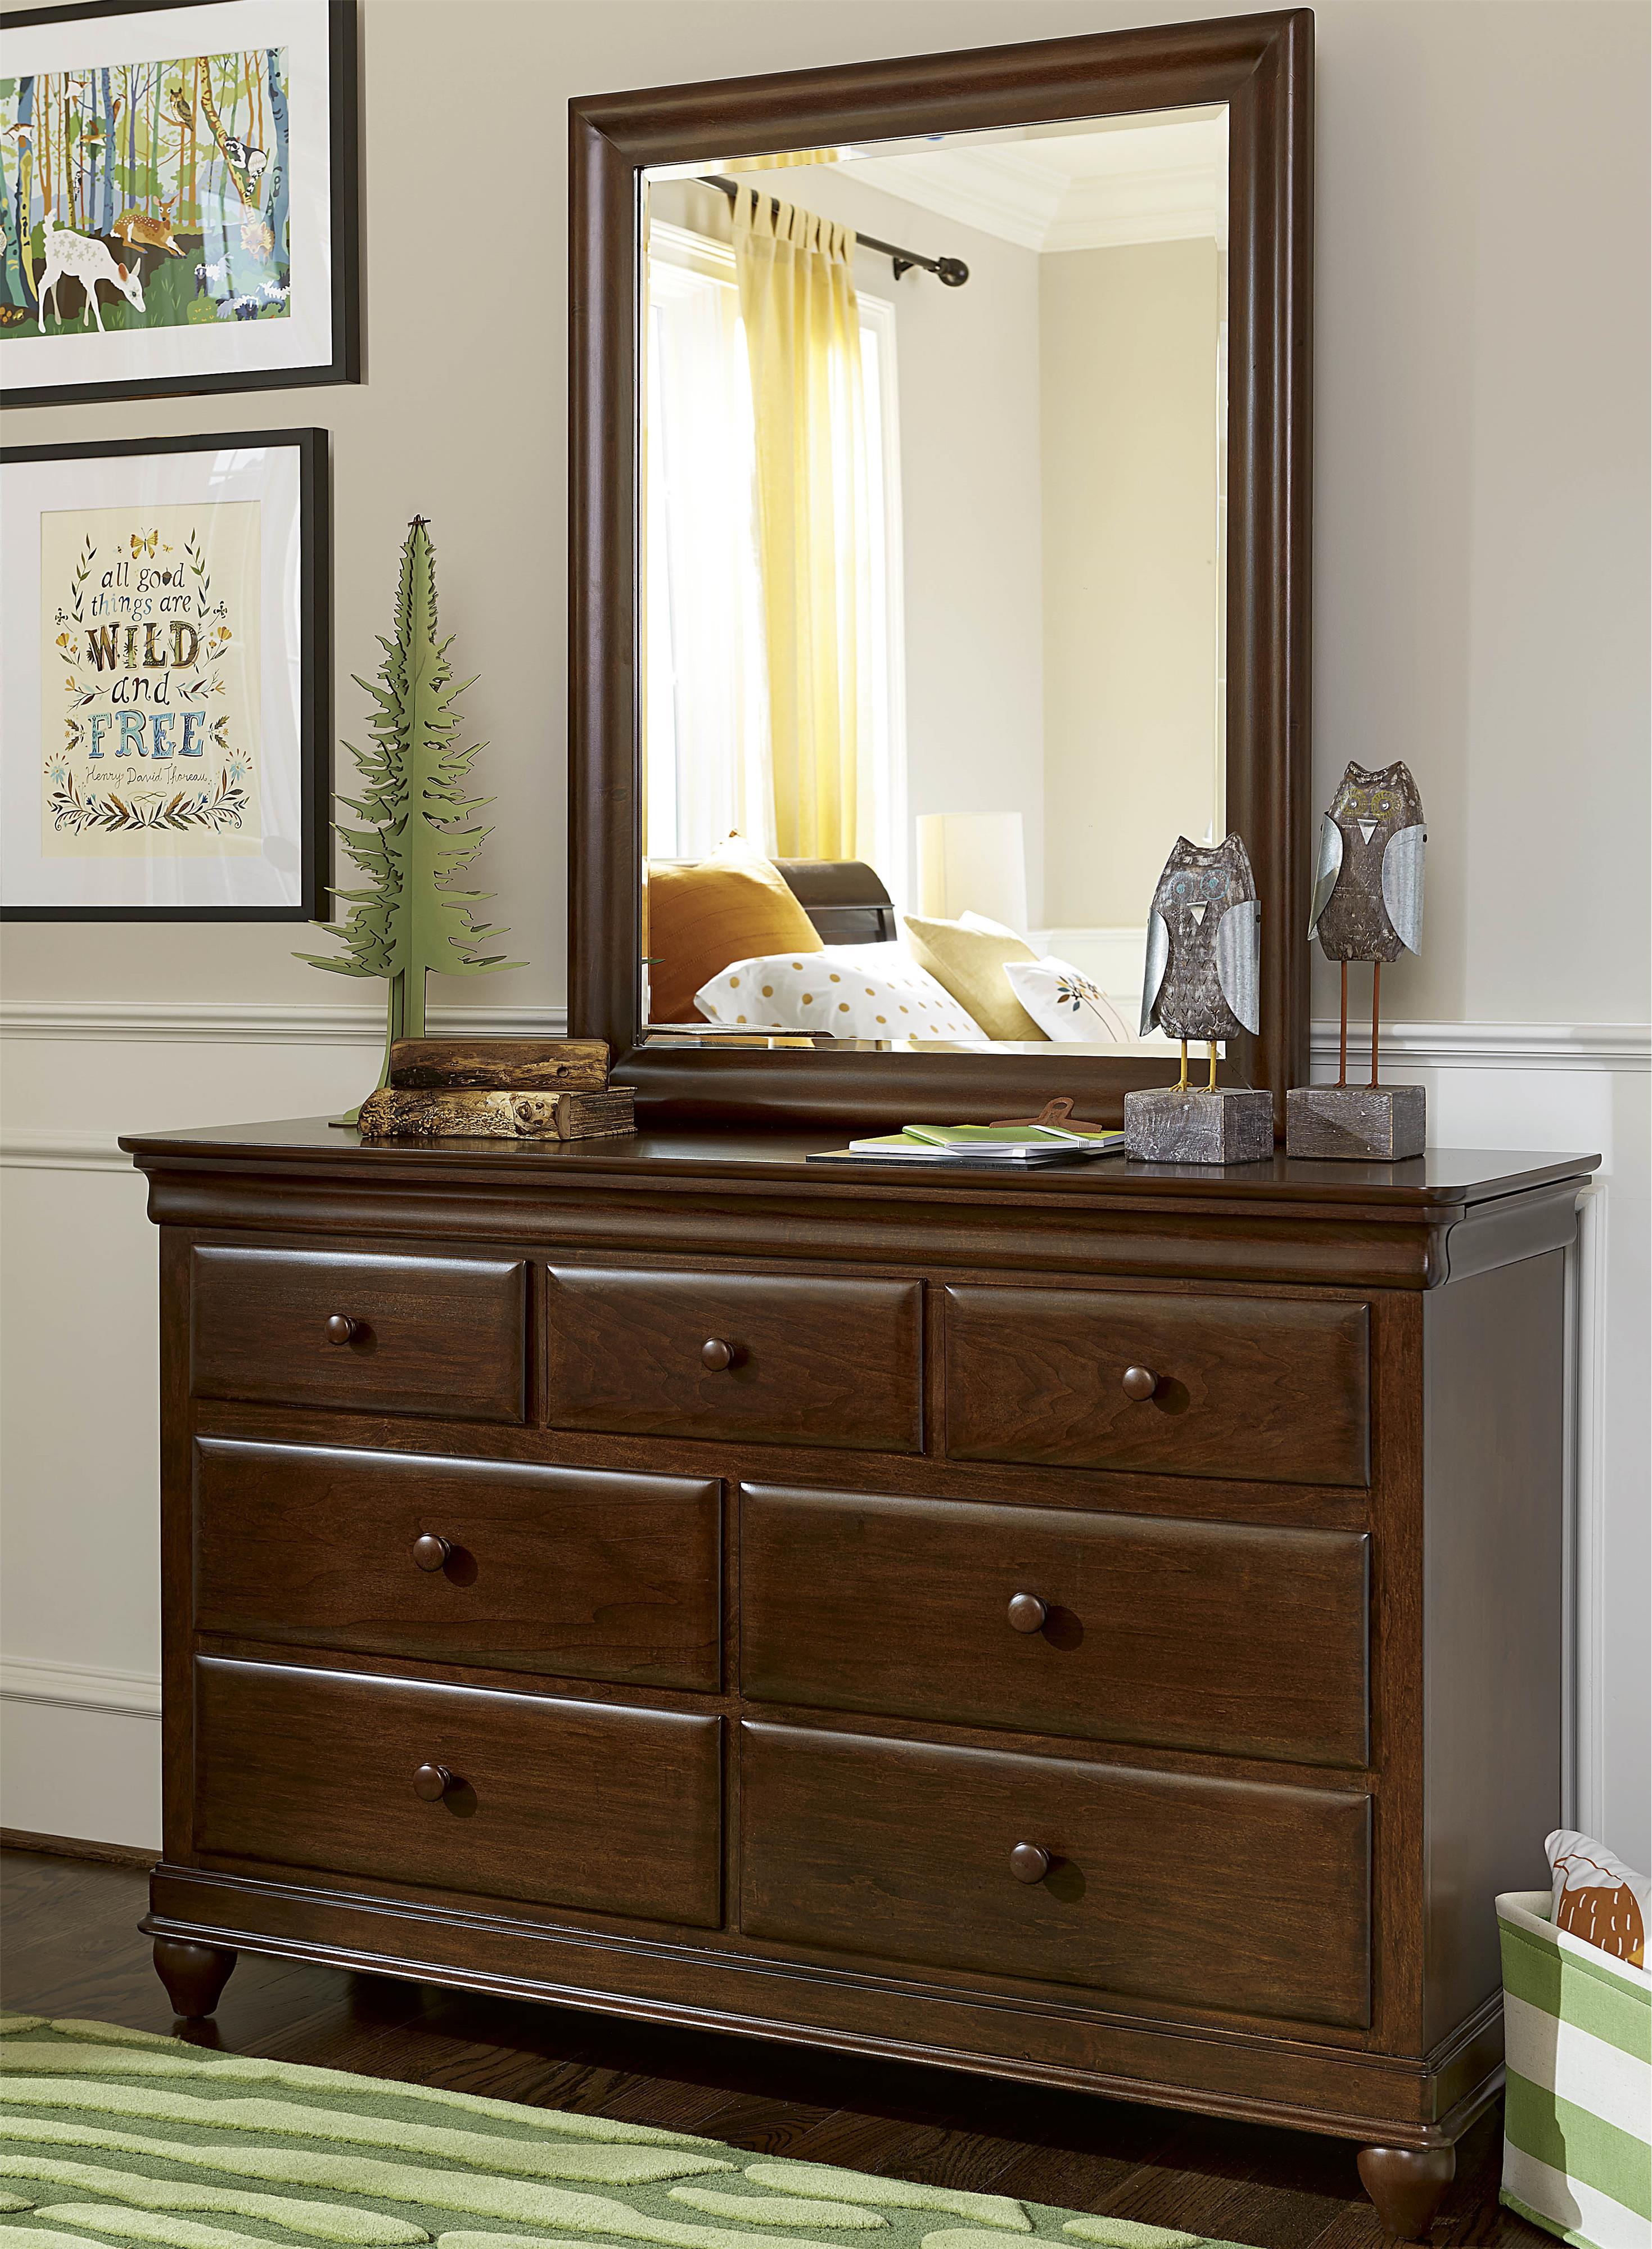 Smartstuff Classics 4.0 Drawer Dresser & Mirror - Item Number: 1312002+032